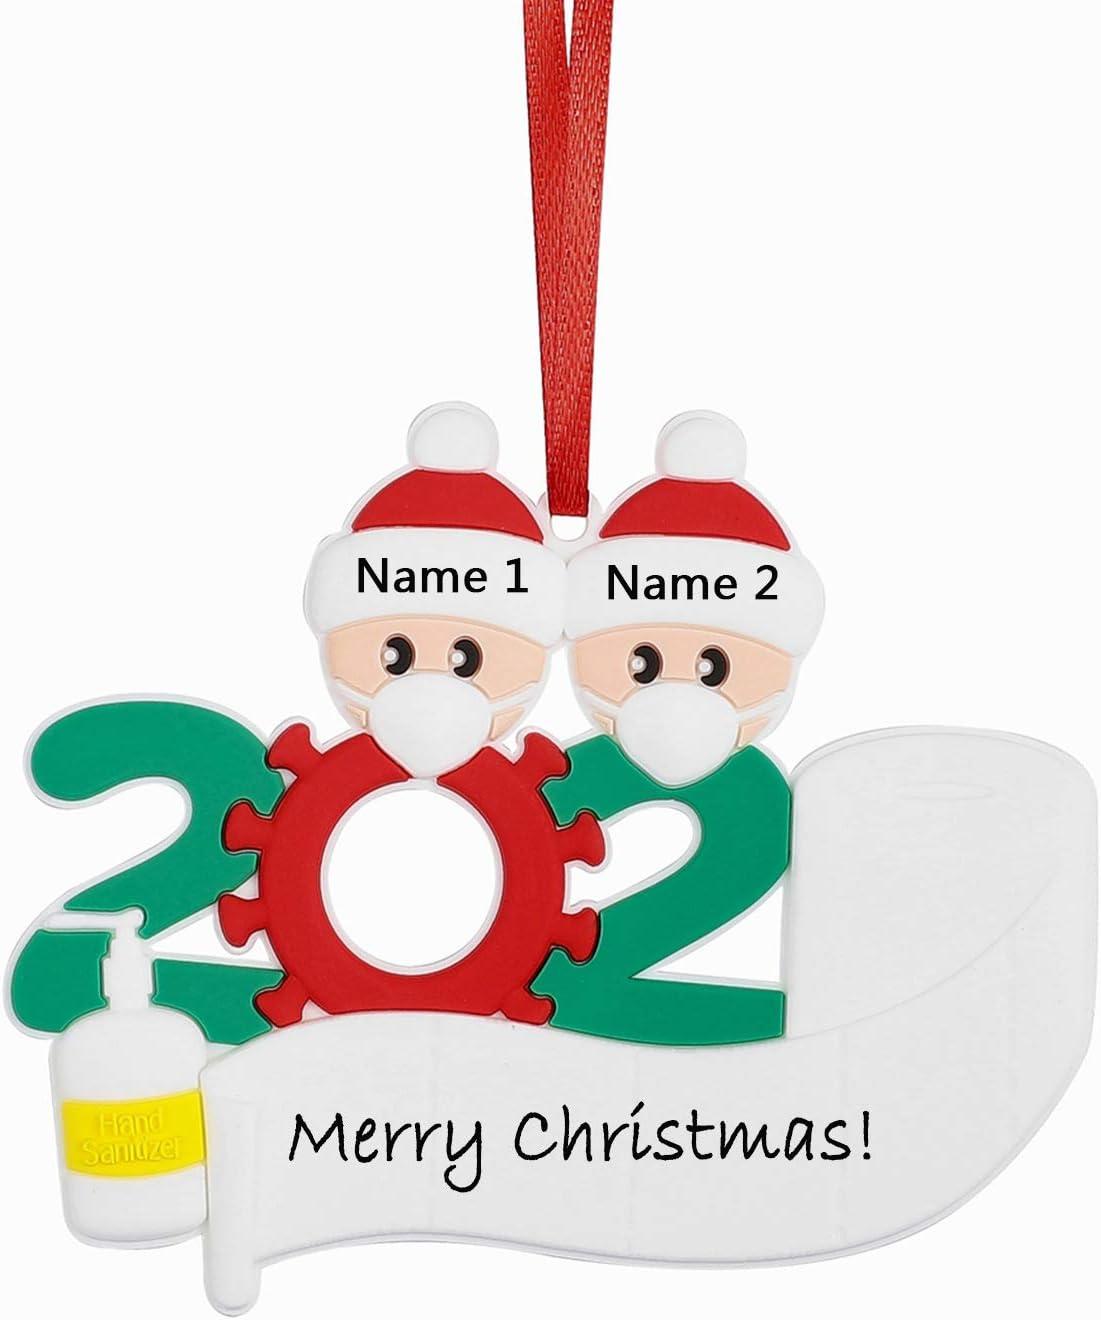 Amazon.com: Ukedio Personalized Decorative Hanging Ornaments 2020